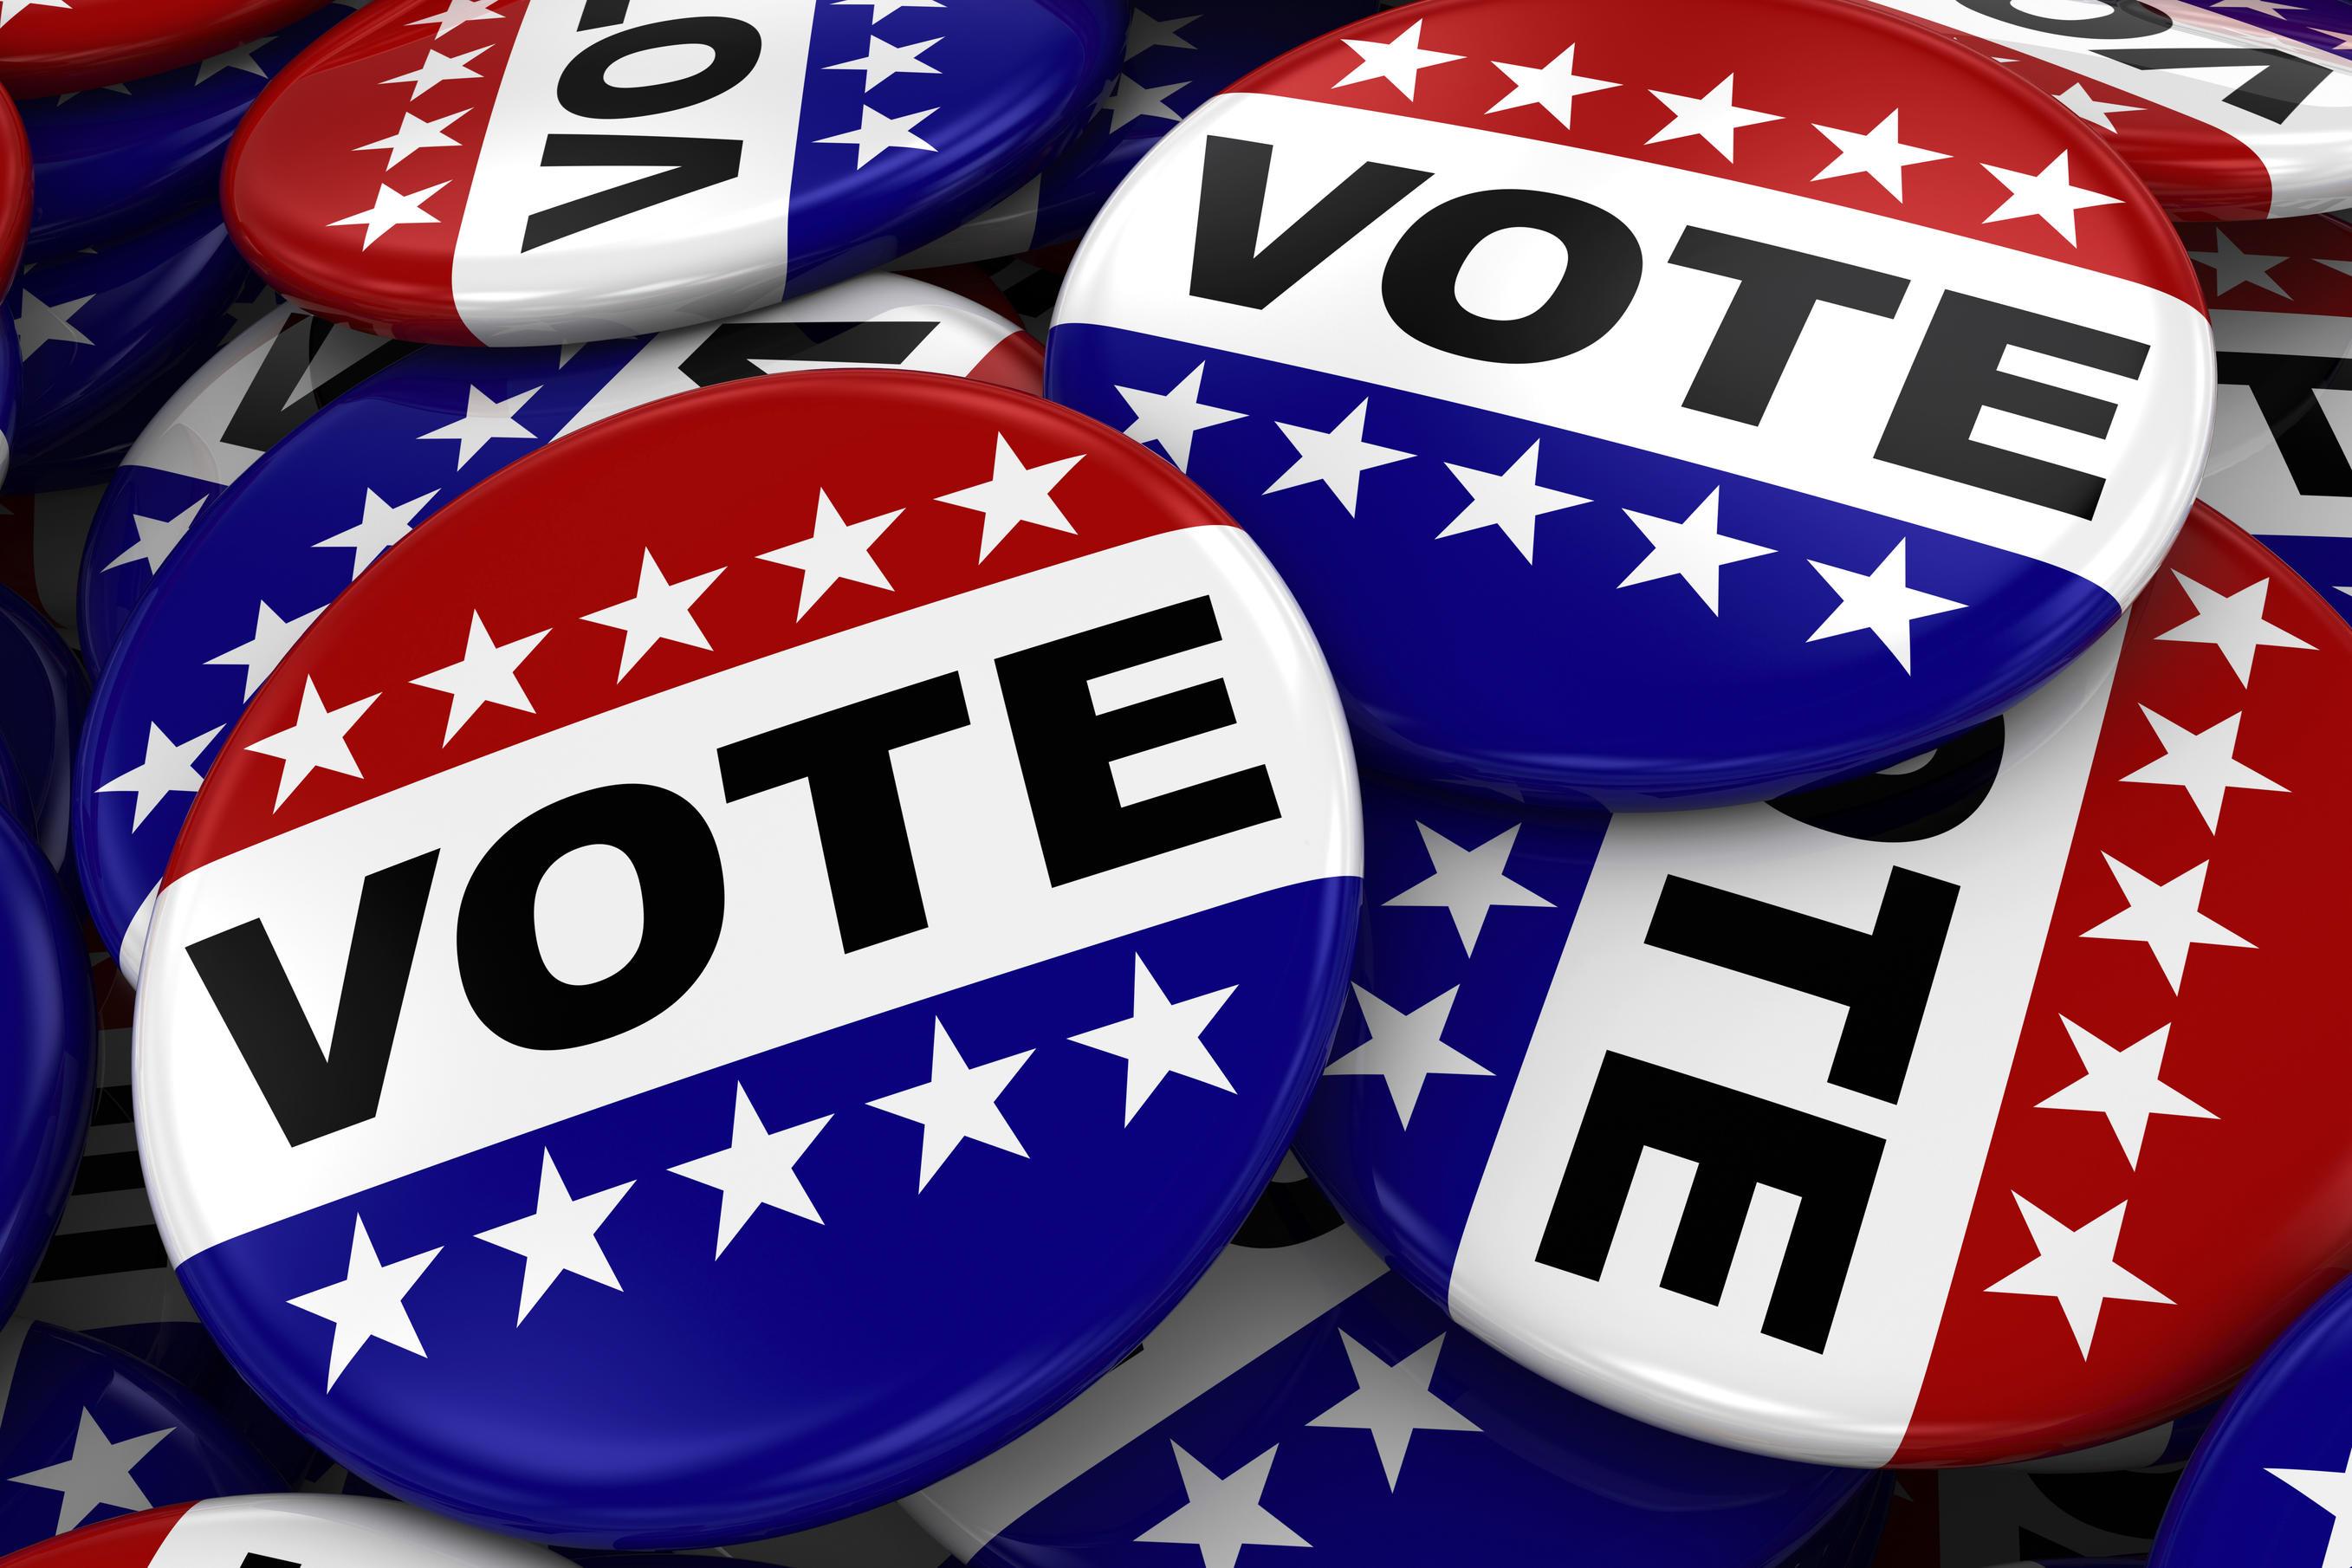 Patriotic vote buttons